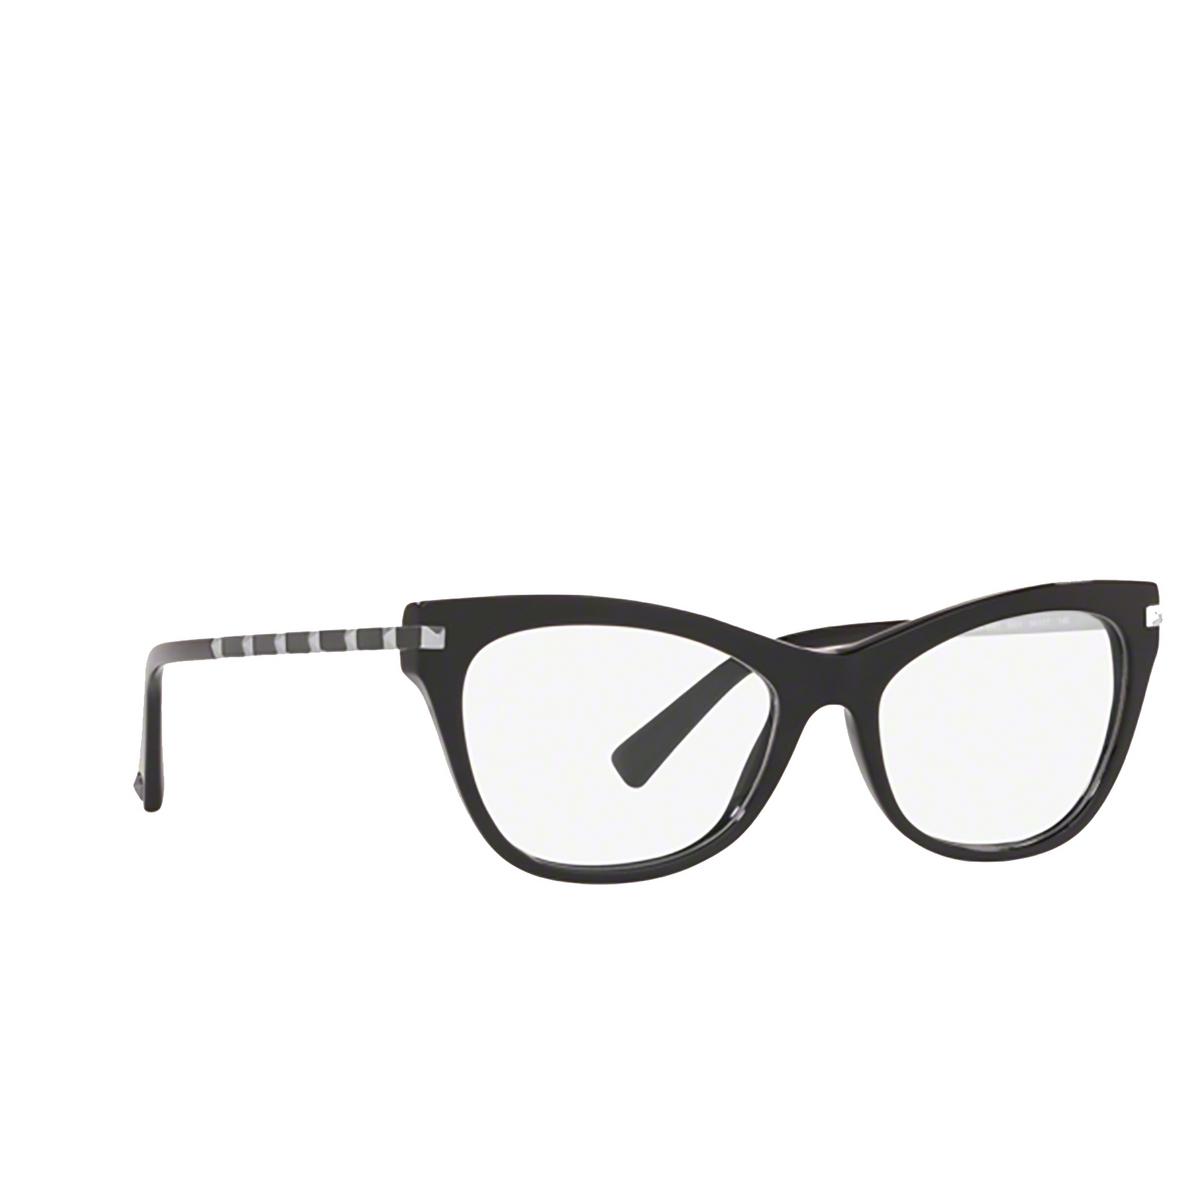 Valentino® Cat-eye Eyeglasses: VA3041 color Black 5001 - three-quarters view.